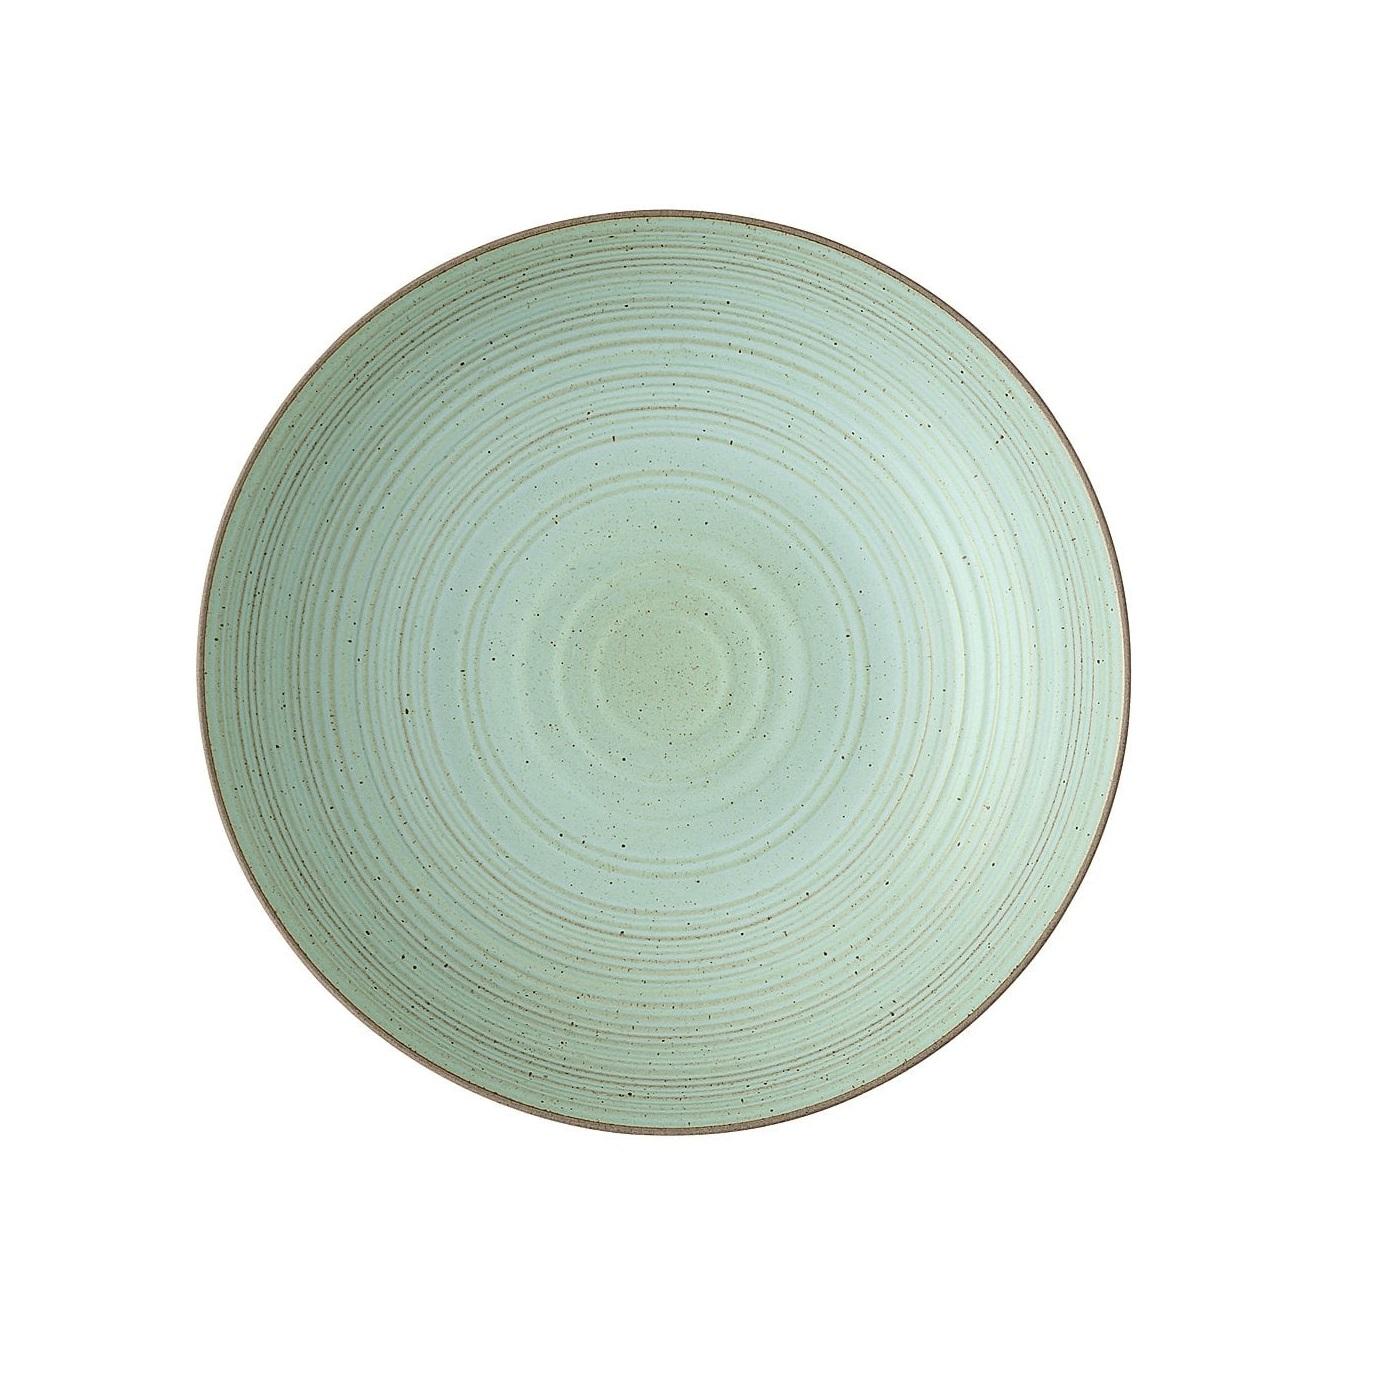 Онлайн каталог PROMENU: Тарелка глубокая керамическая Thomas Nature, диаметр 23 см, серый                               21730-227072-60323